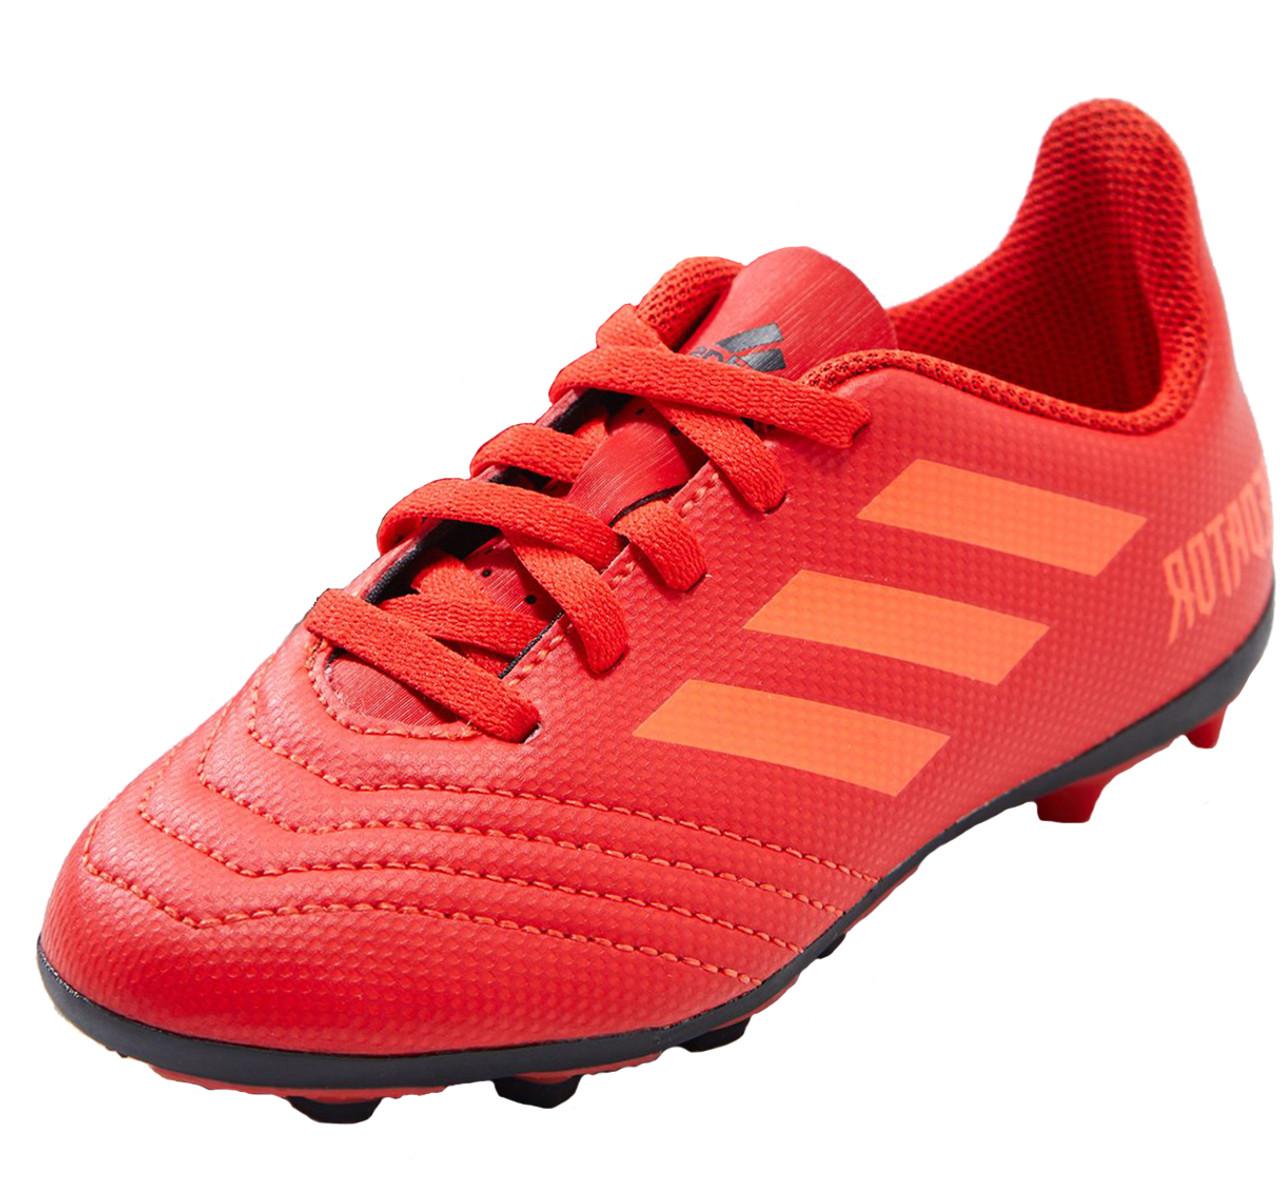 746564597 Adidas Predator 19.4 FG Jr - Active Red Solar Red Core Black (051319) - ohp  soccer